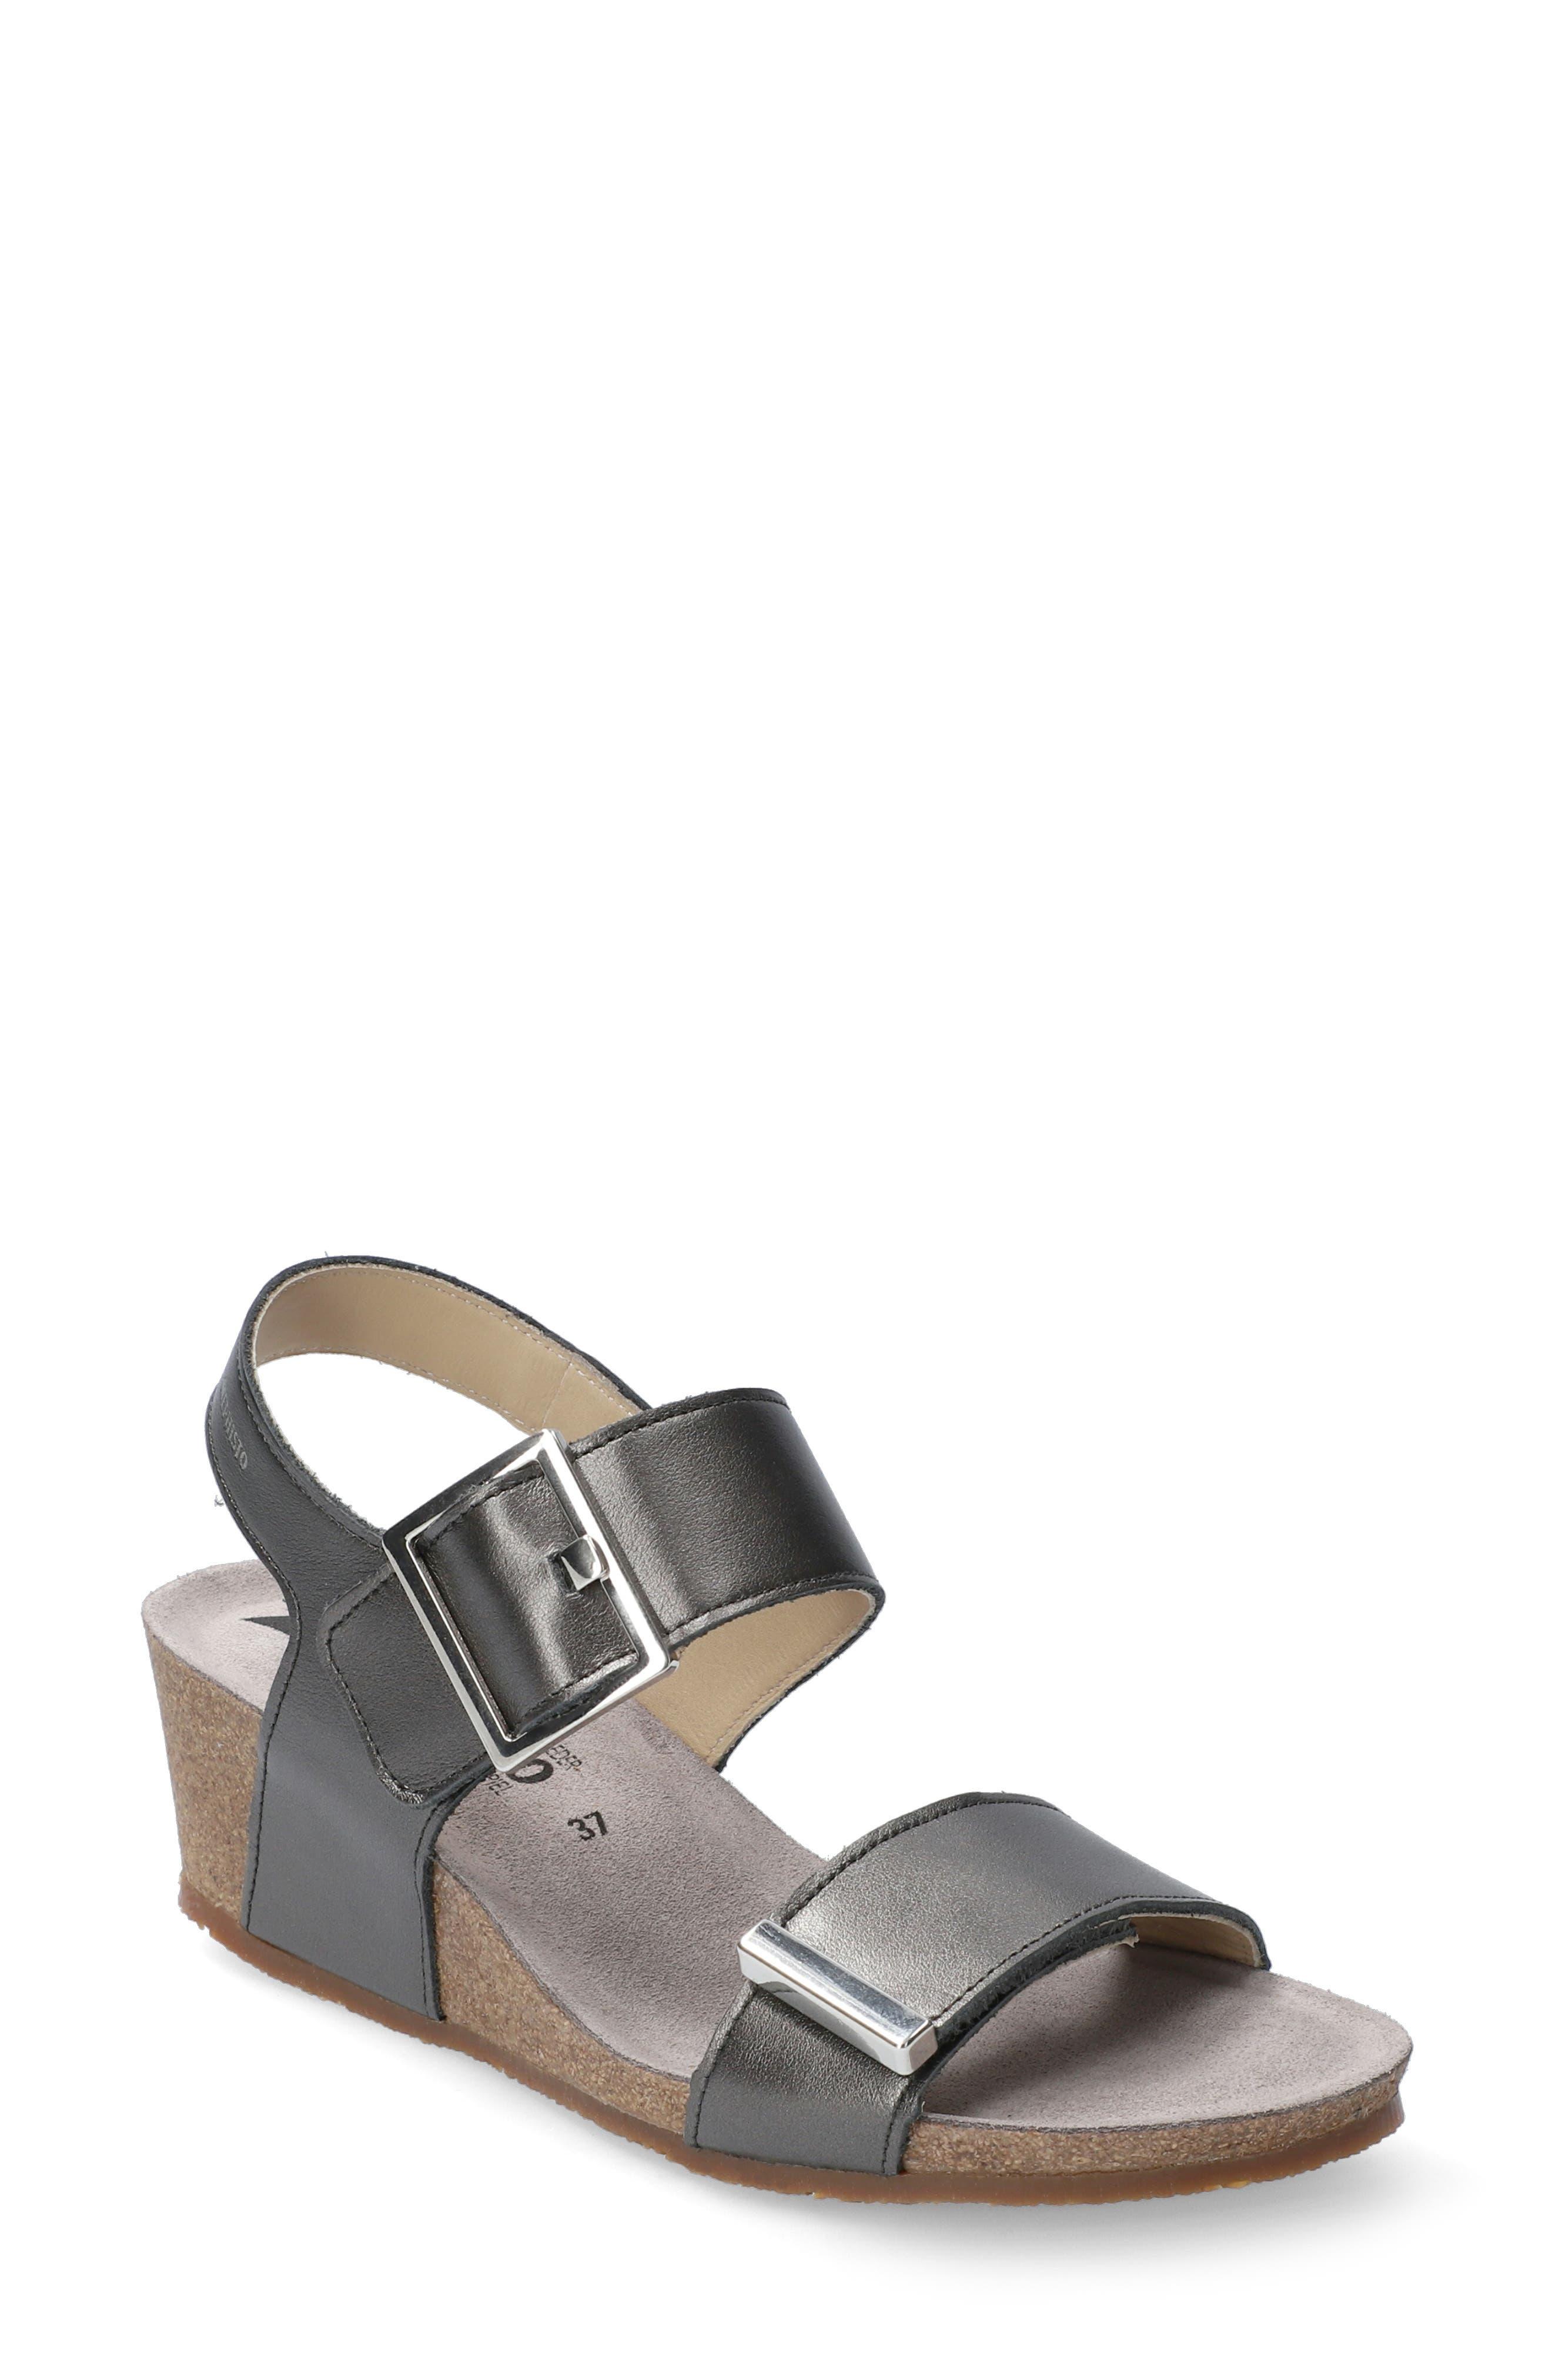 Morgana Wedge Sandal